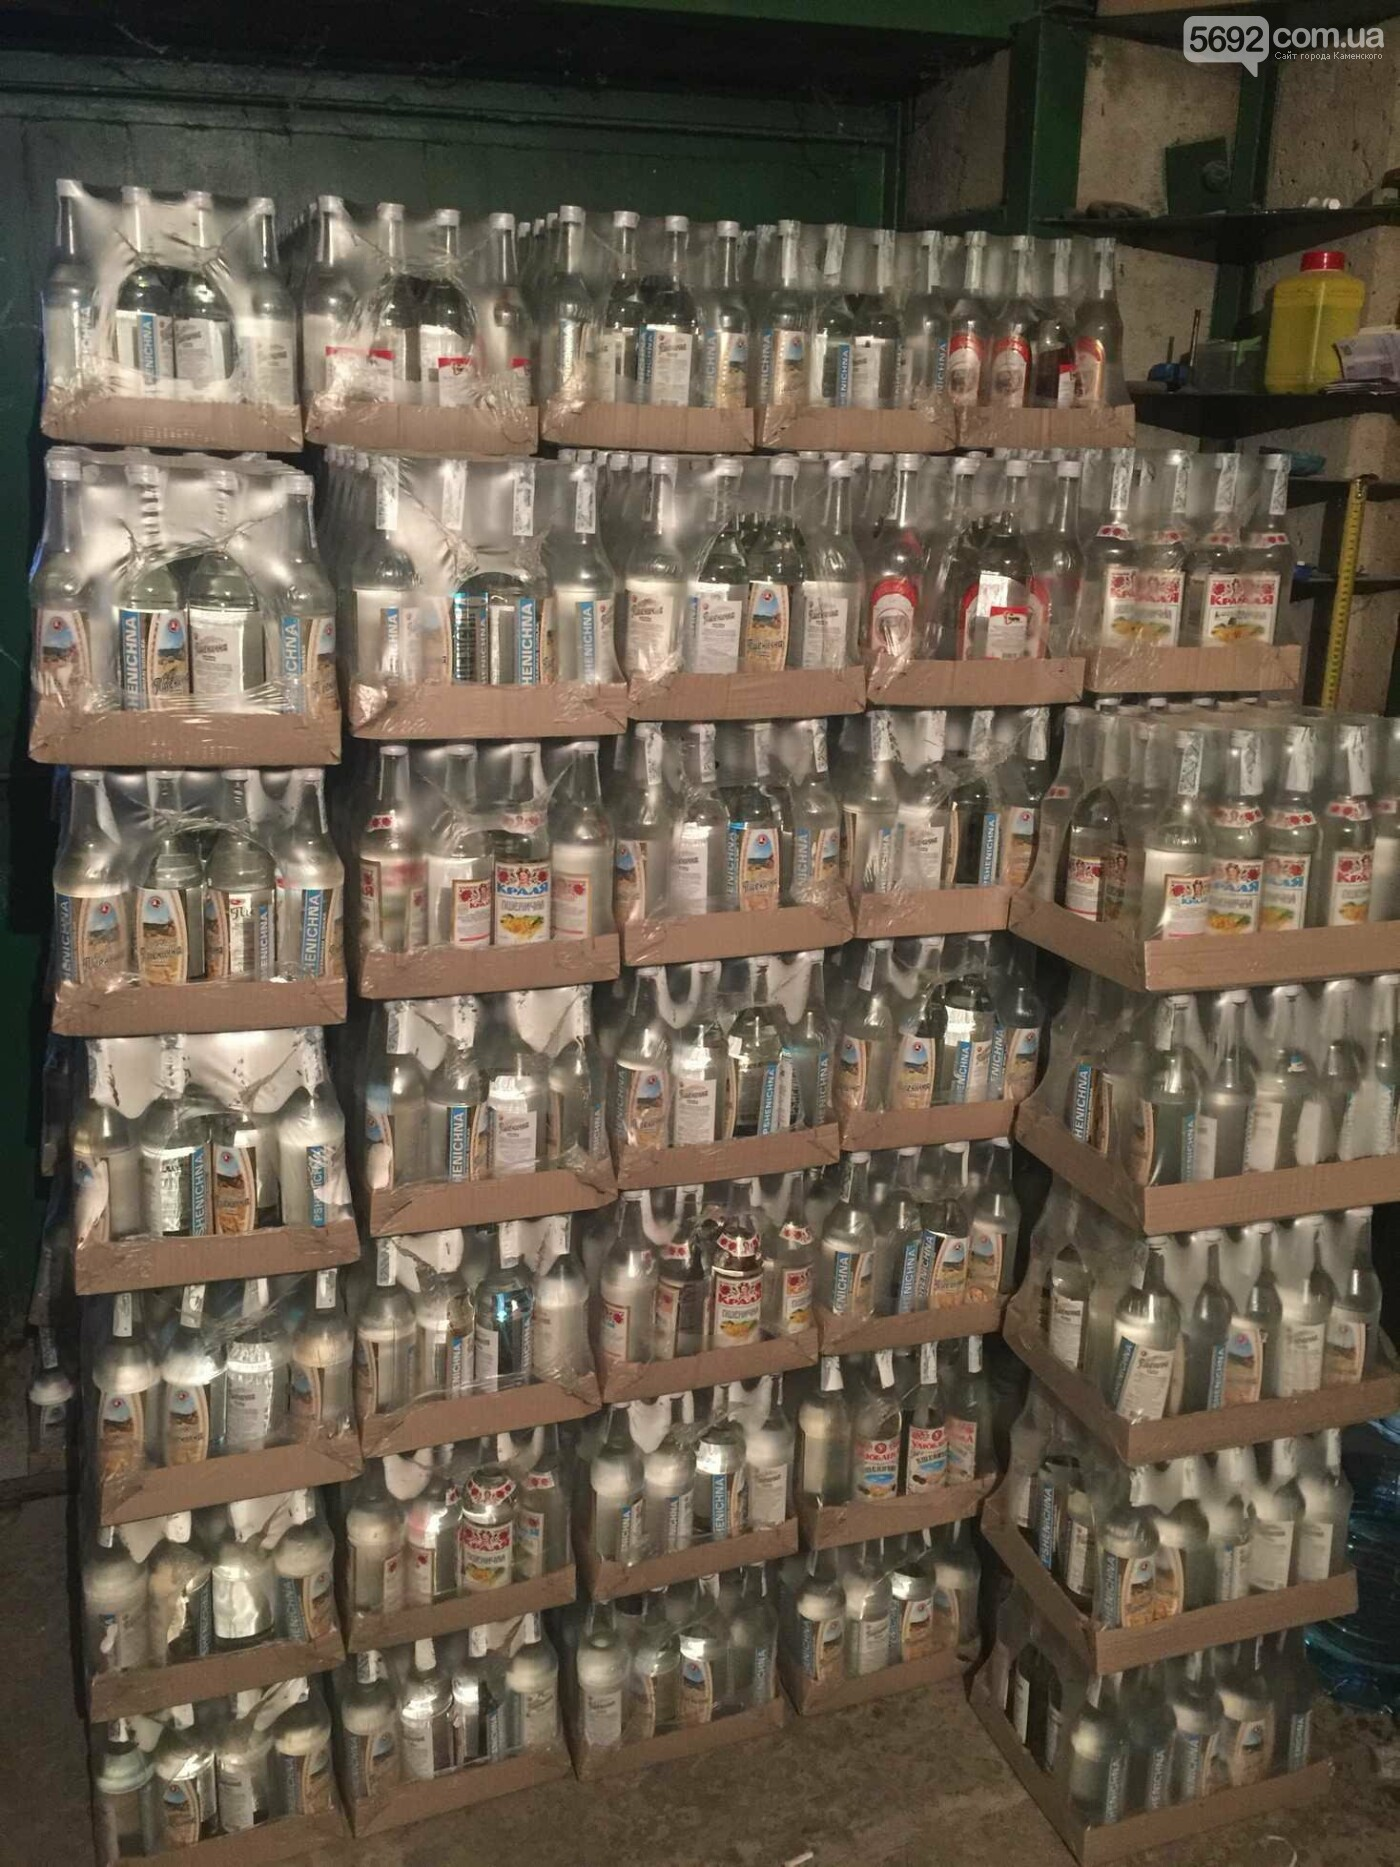 Прокуратура и полиция Каменского изъяли паленую водку, фото-5